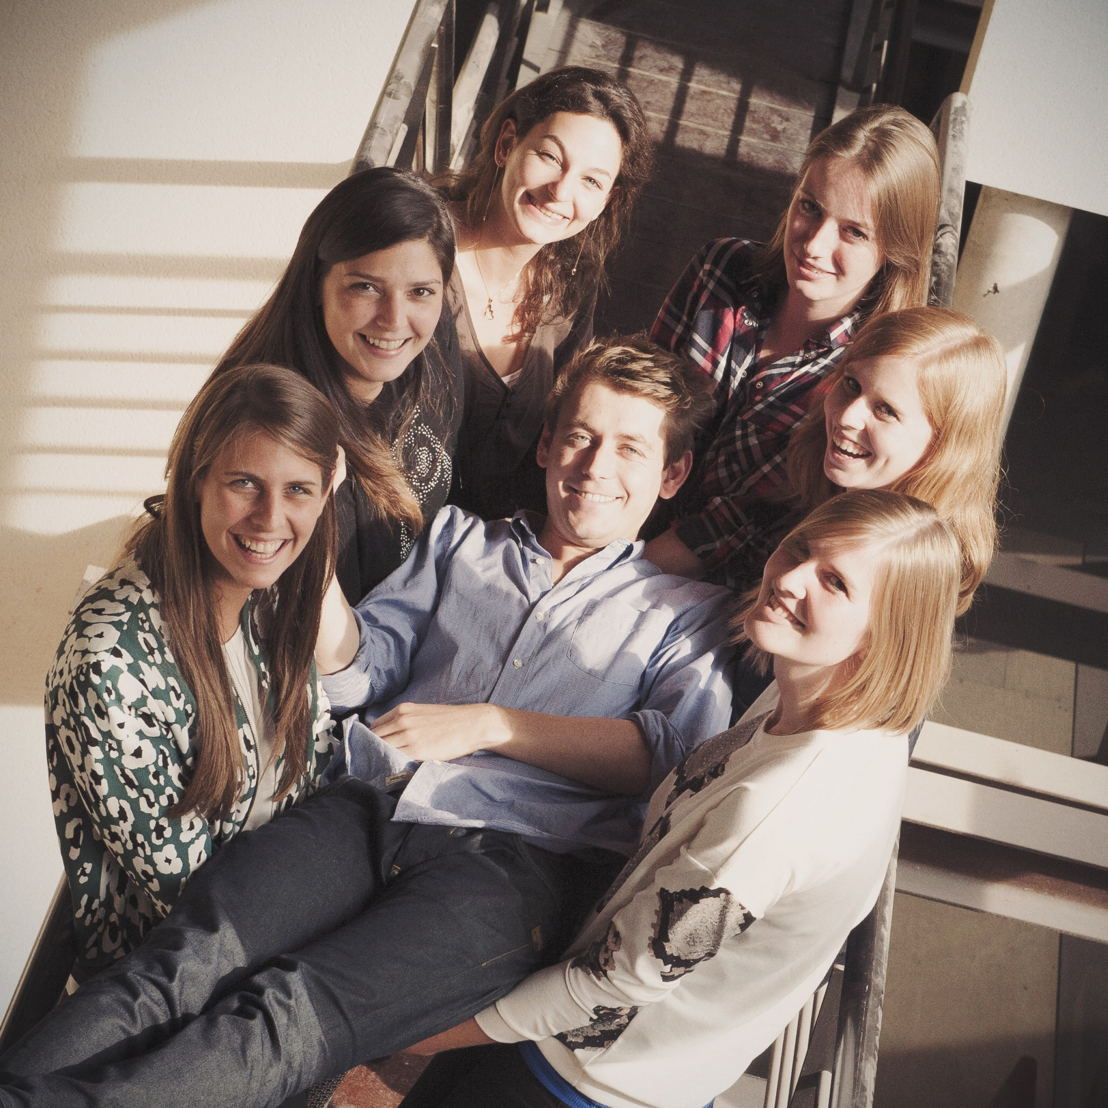 vlnr: Pauline, Olivia, Nada, PJ, Astrid, Charis & Stephanie